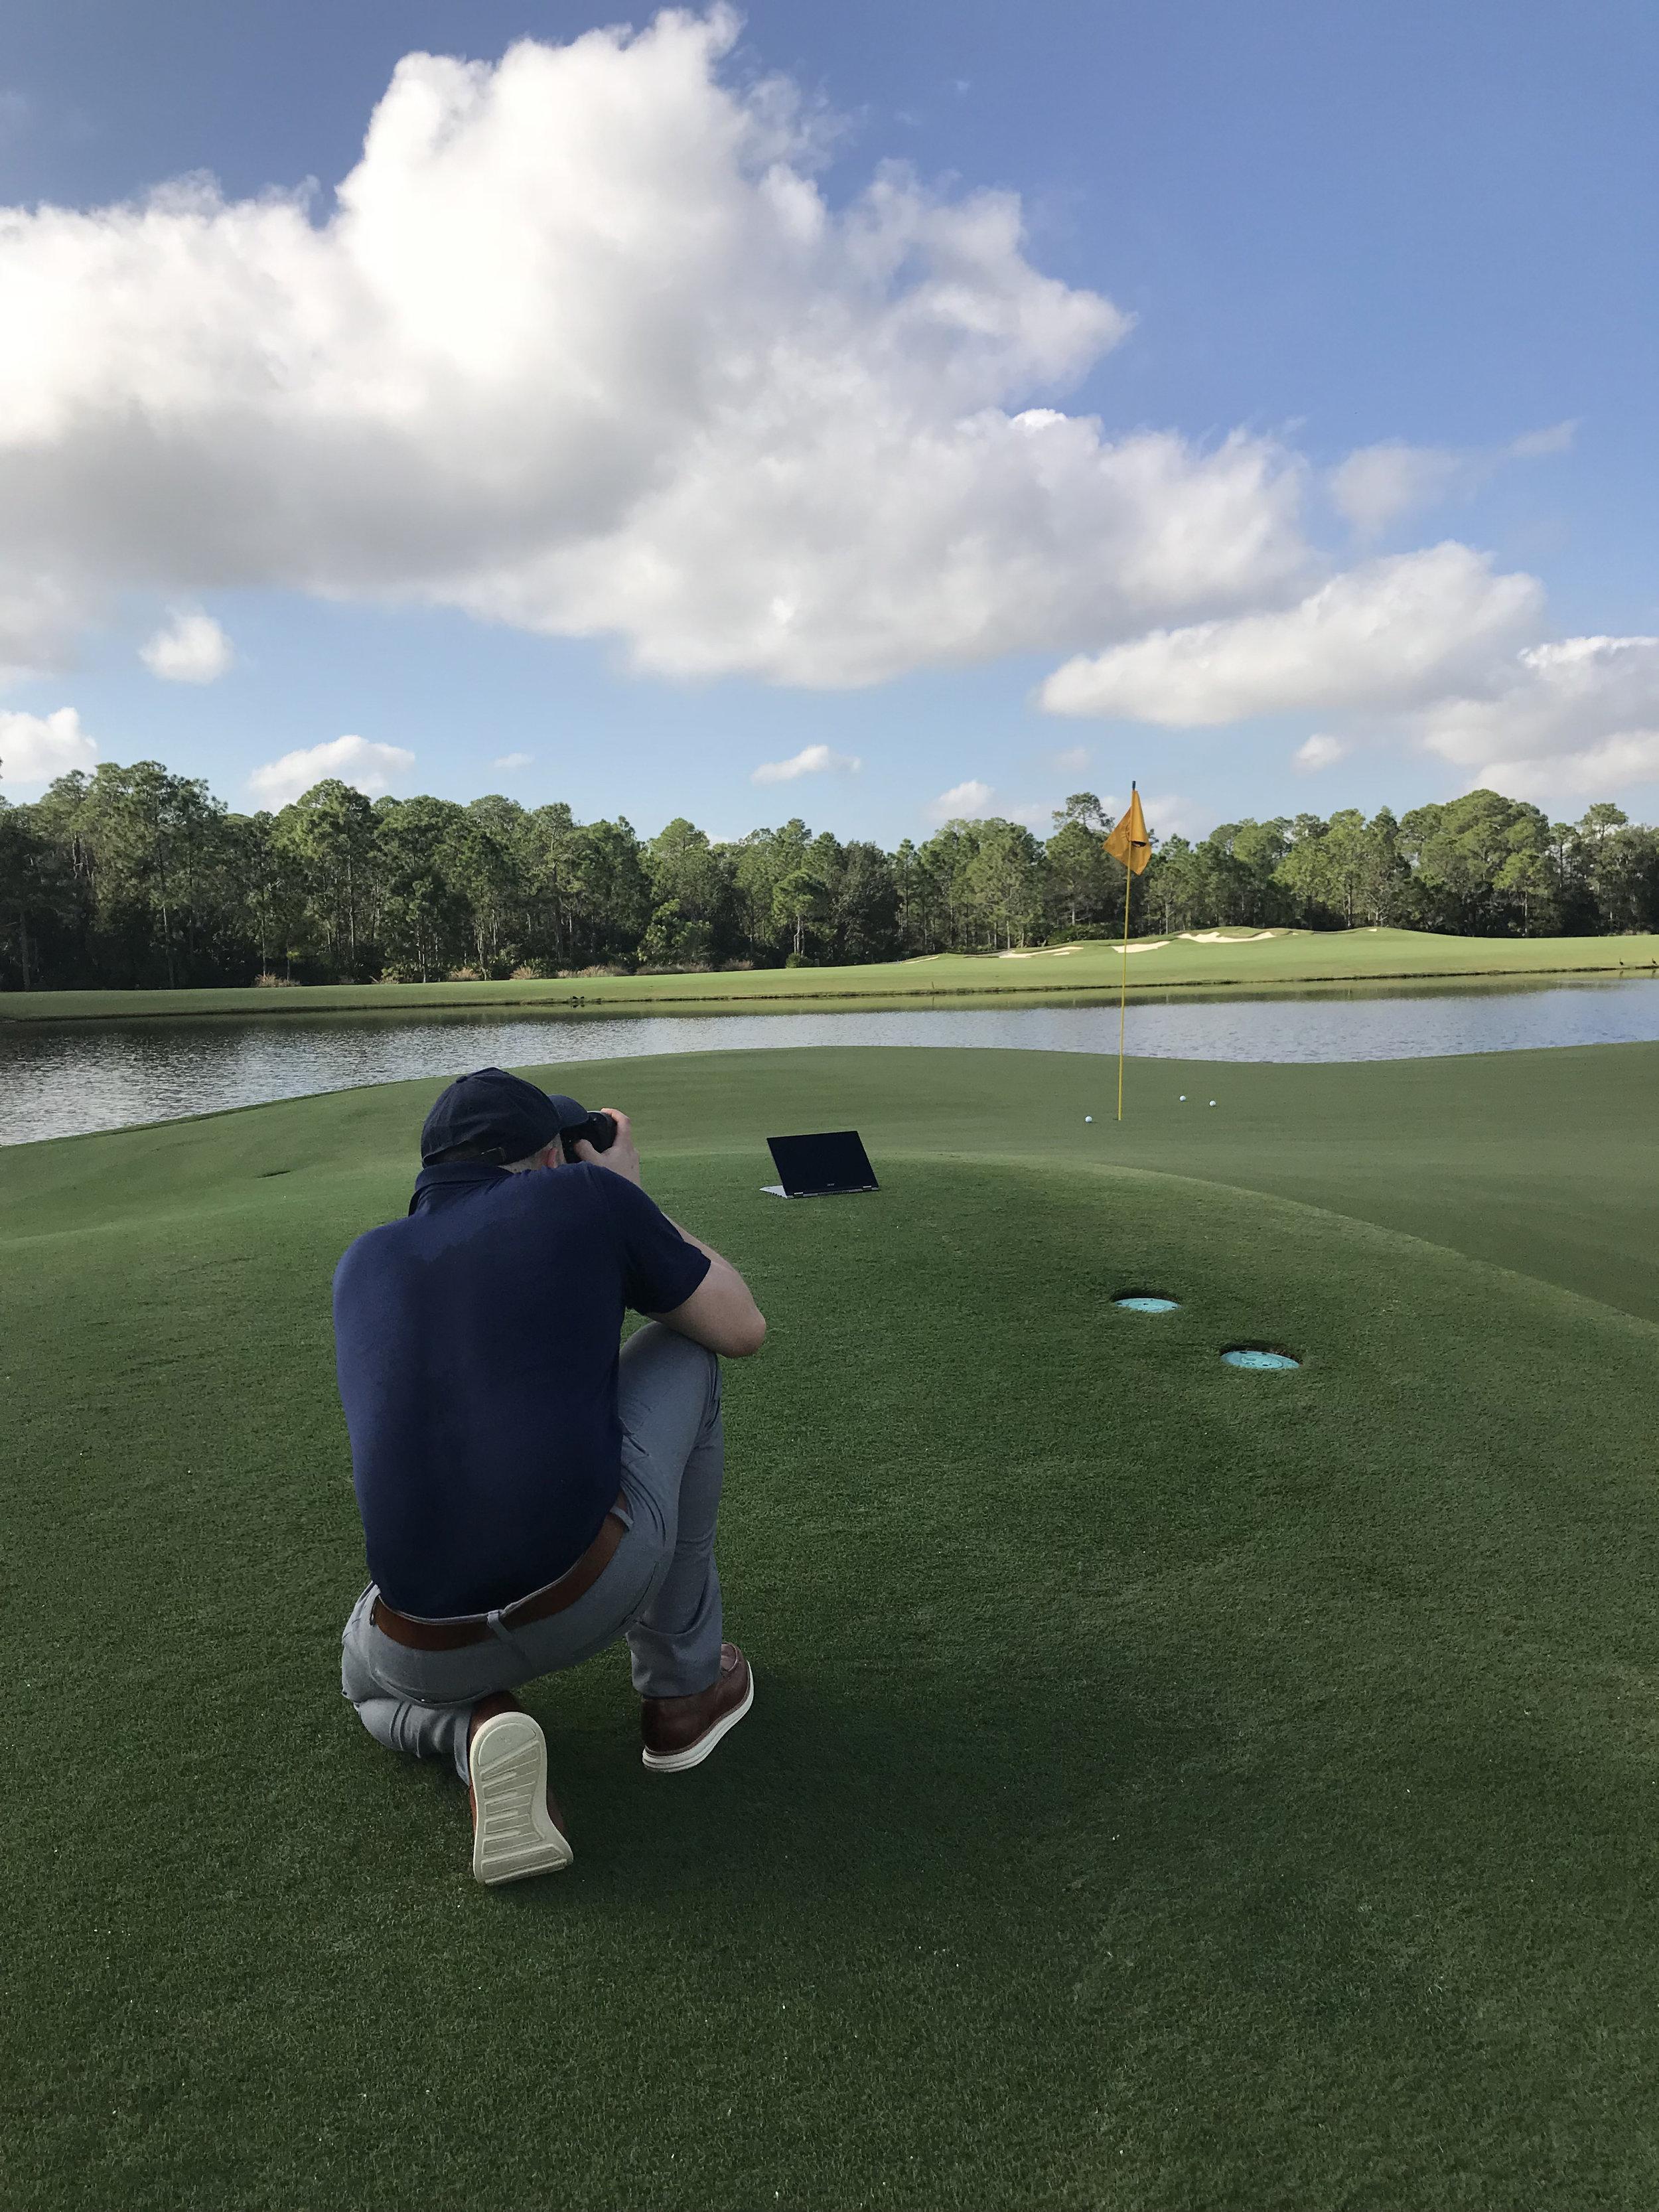 Nick Pecori Tampa Orlando Advertising Commercial Photographer for Acer LPGA Golfer Sandra Gal - 2.jpg